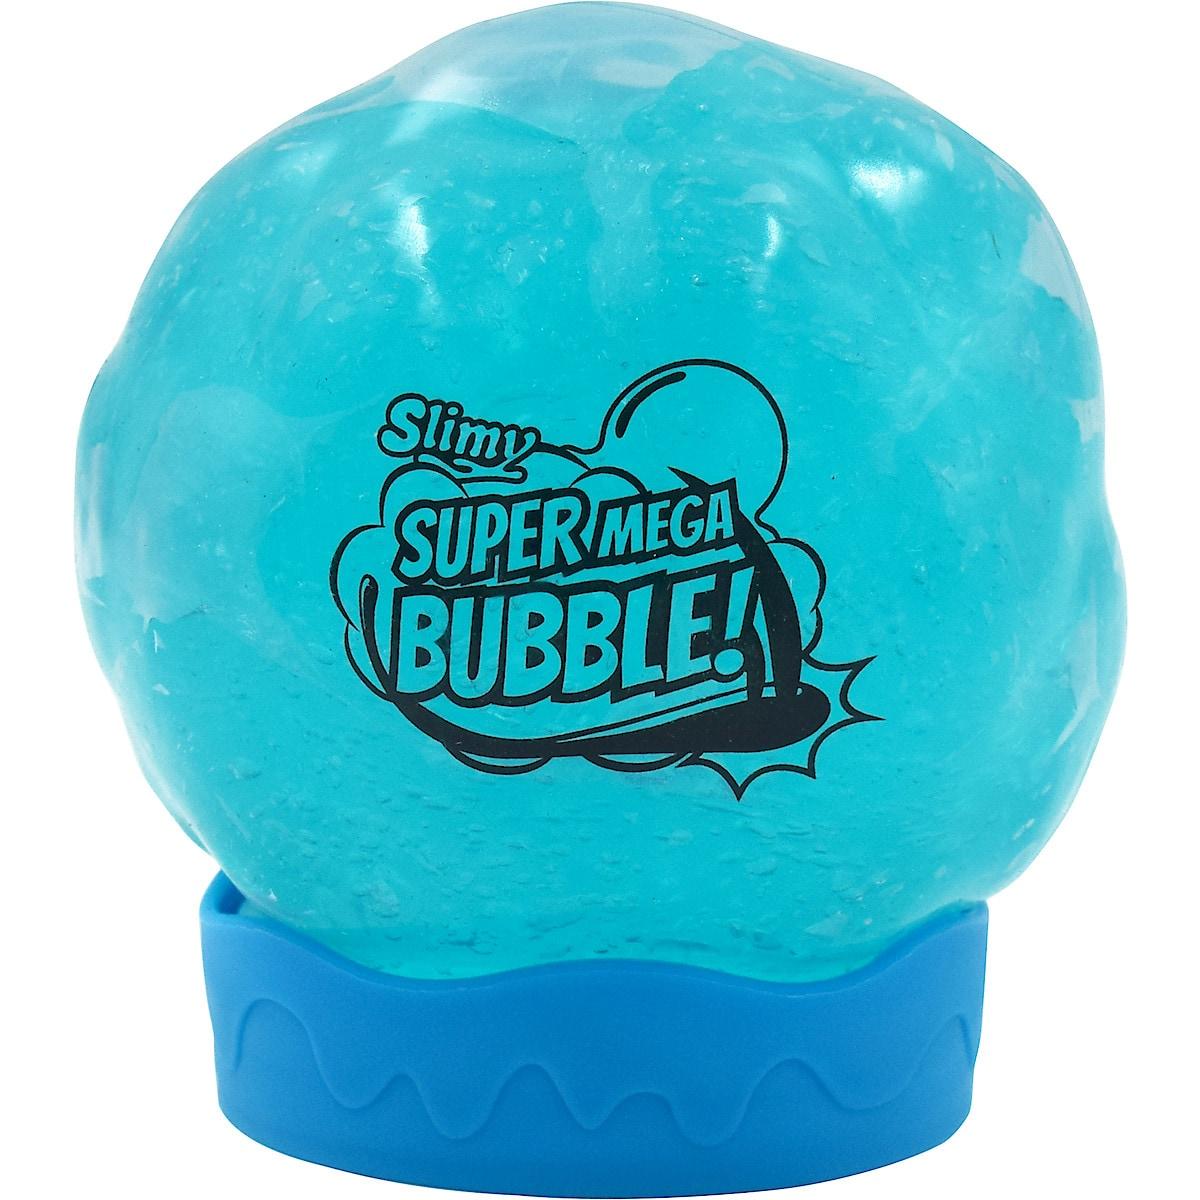 Slime Slimy Super Mega Bubble